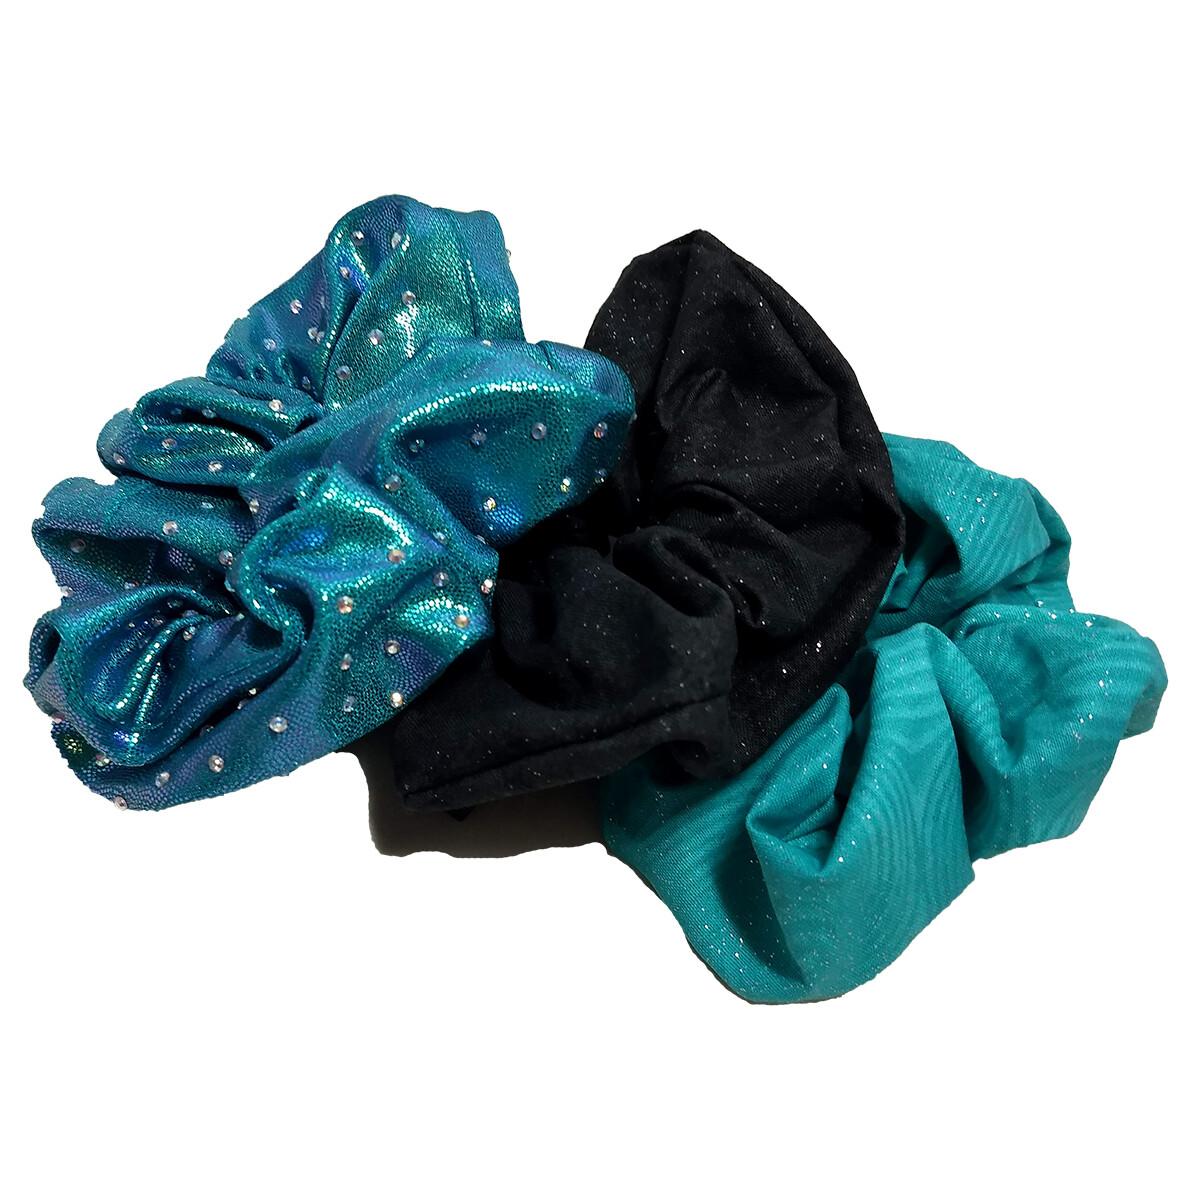 Bling & Sparkle Set Scrunchies (set of 3)